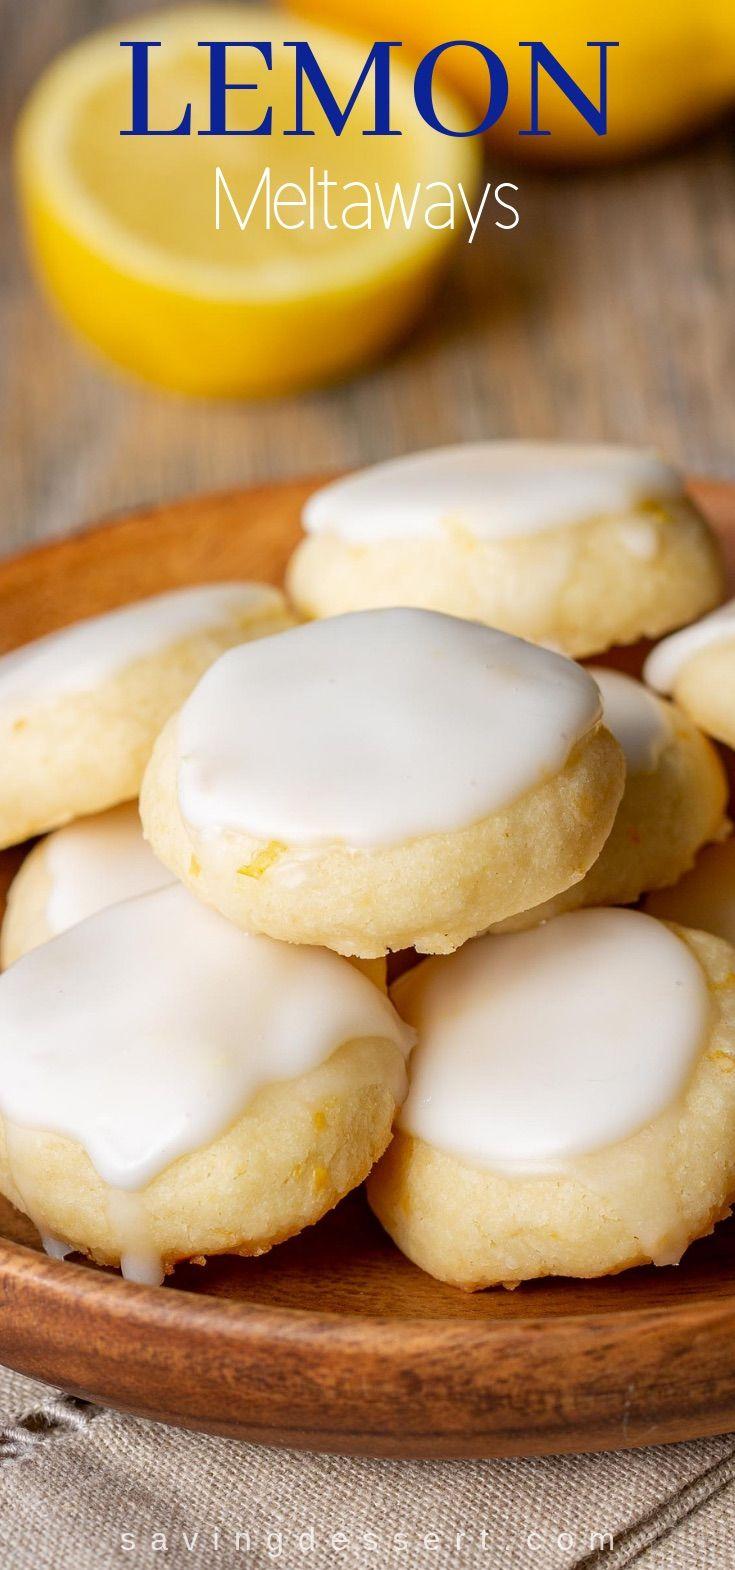 Lemon Meltaways #cookiedesserts